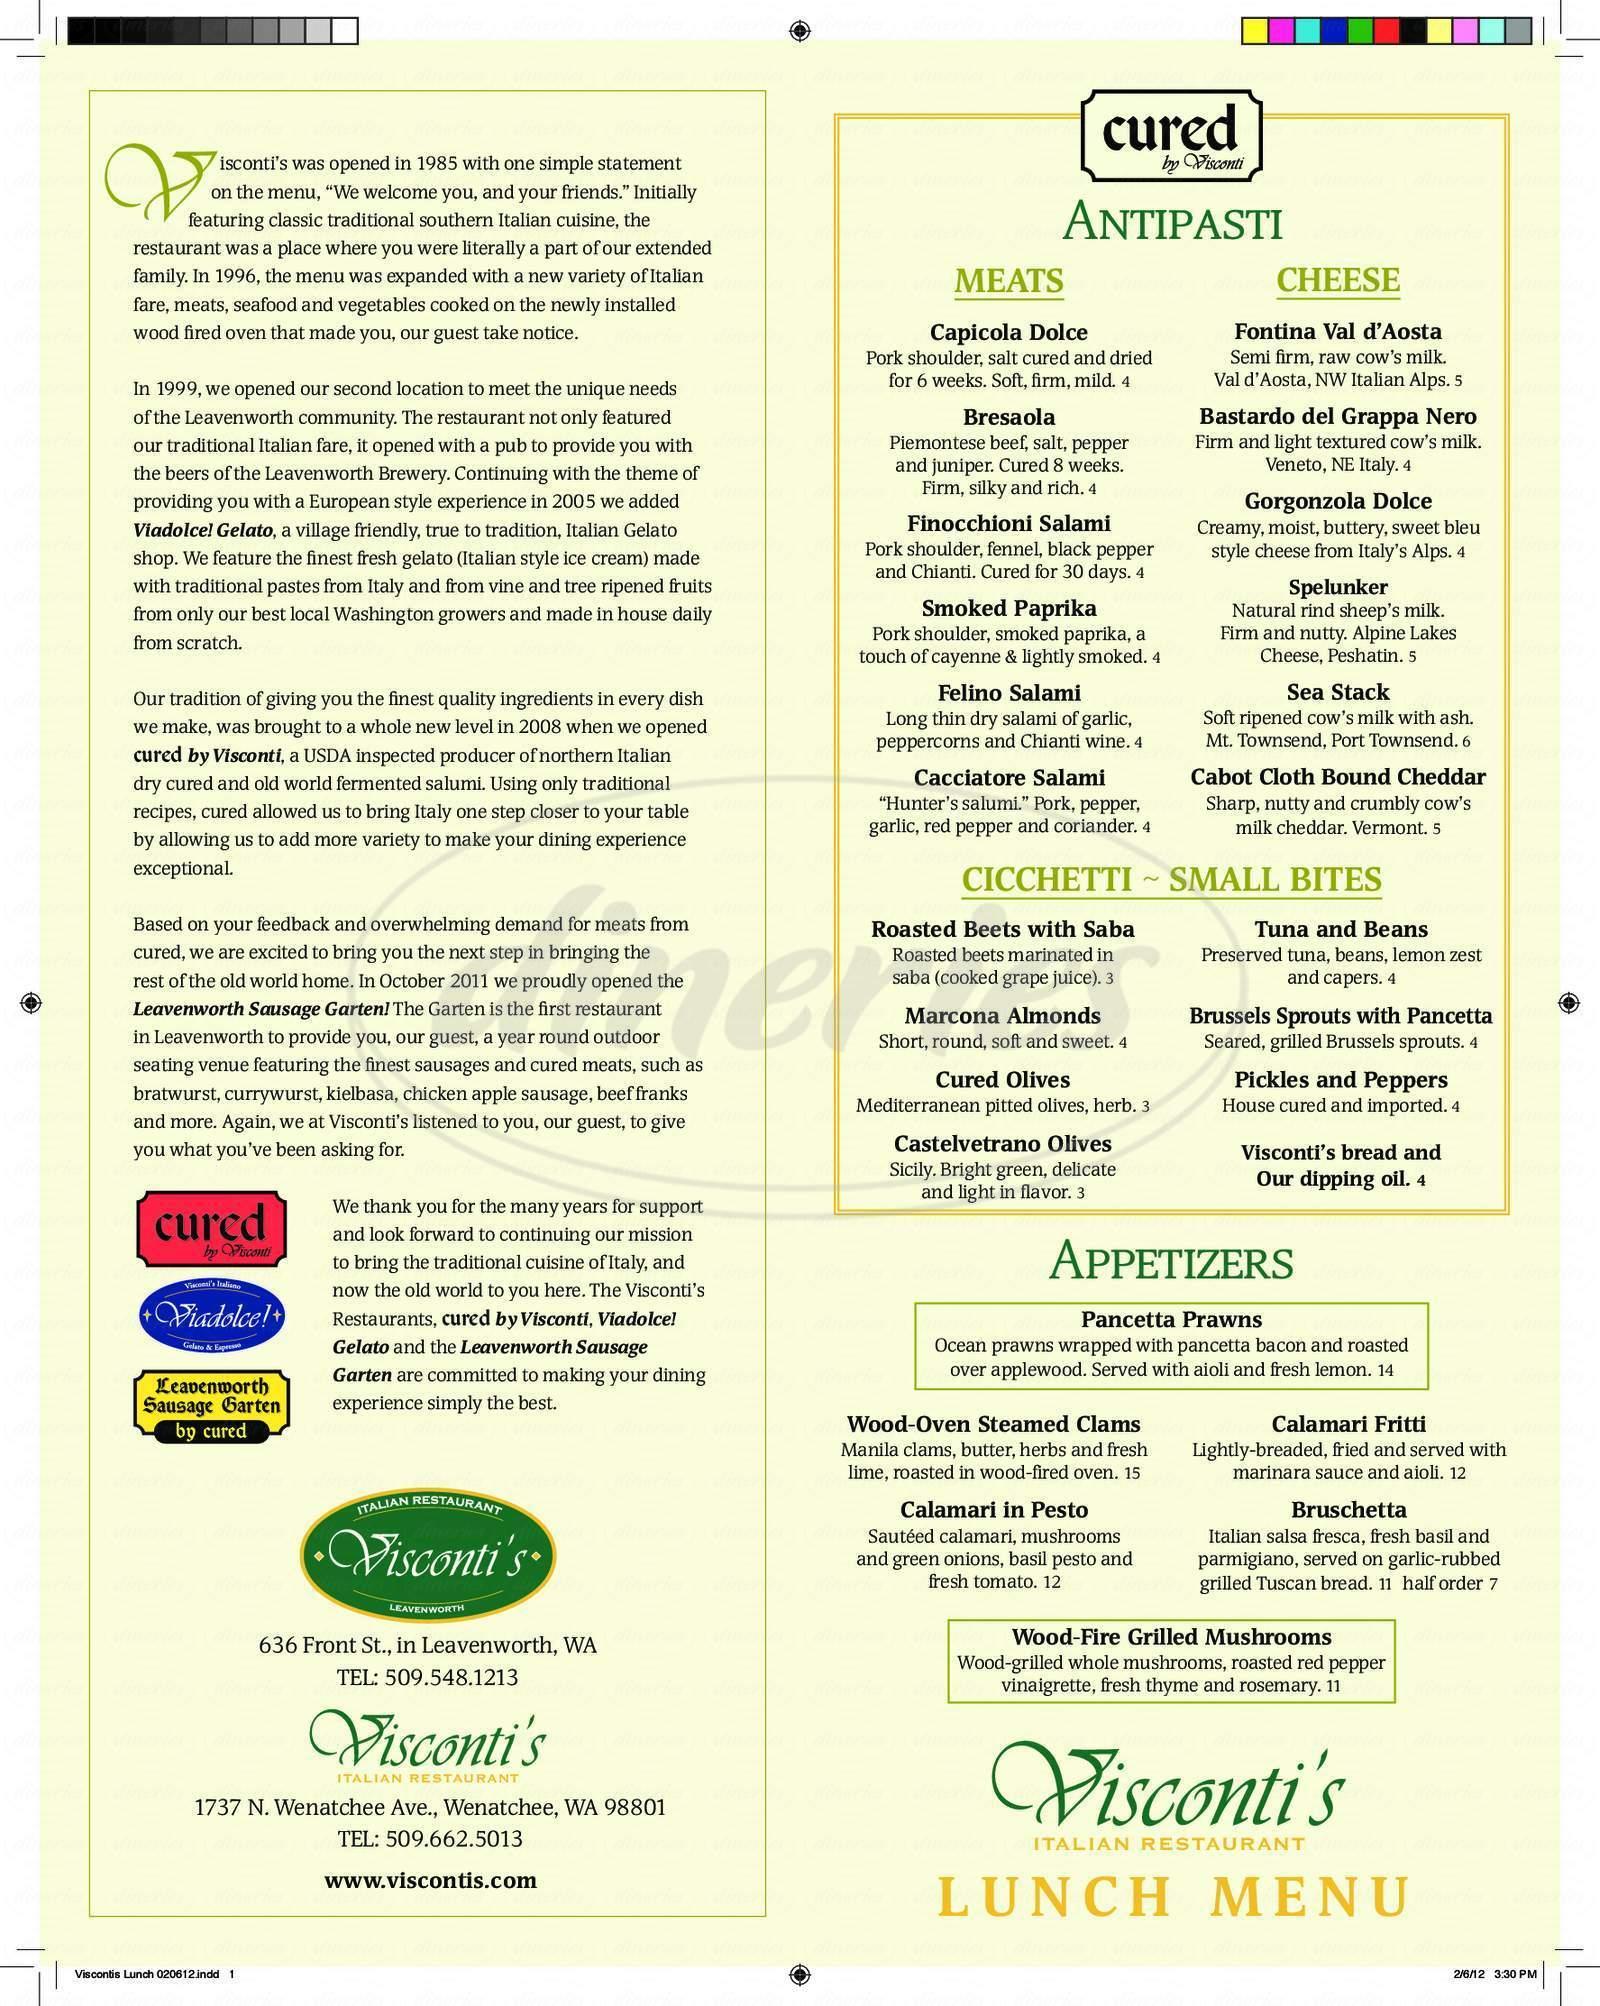 menu for Visconti's Italian Restaurant